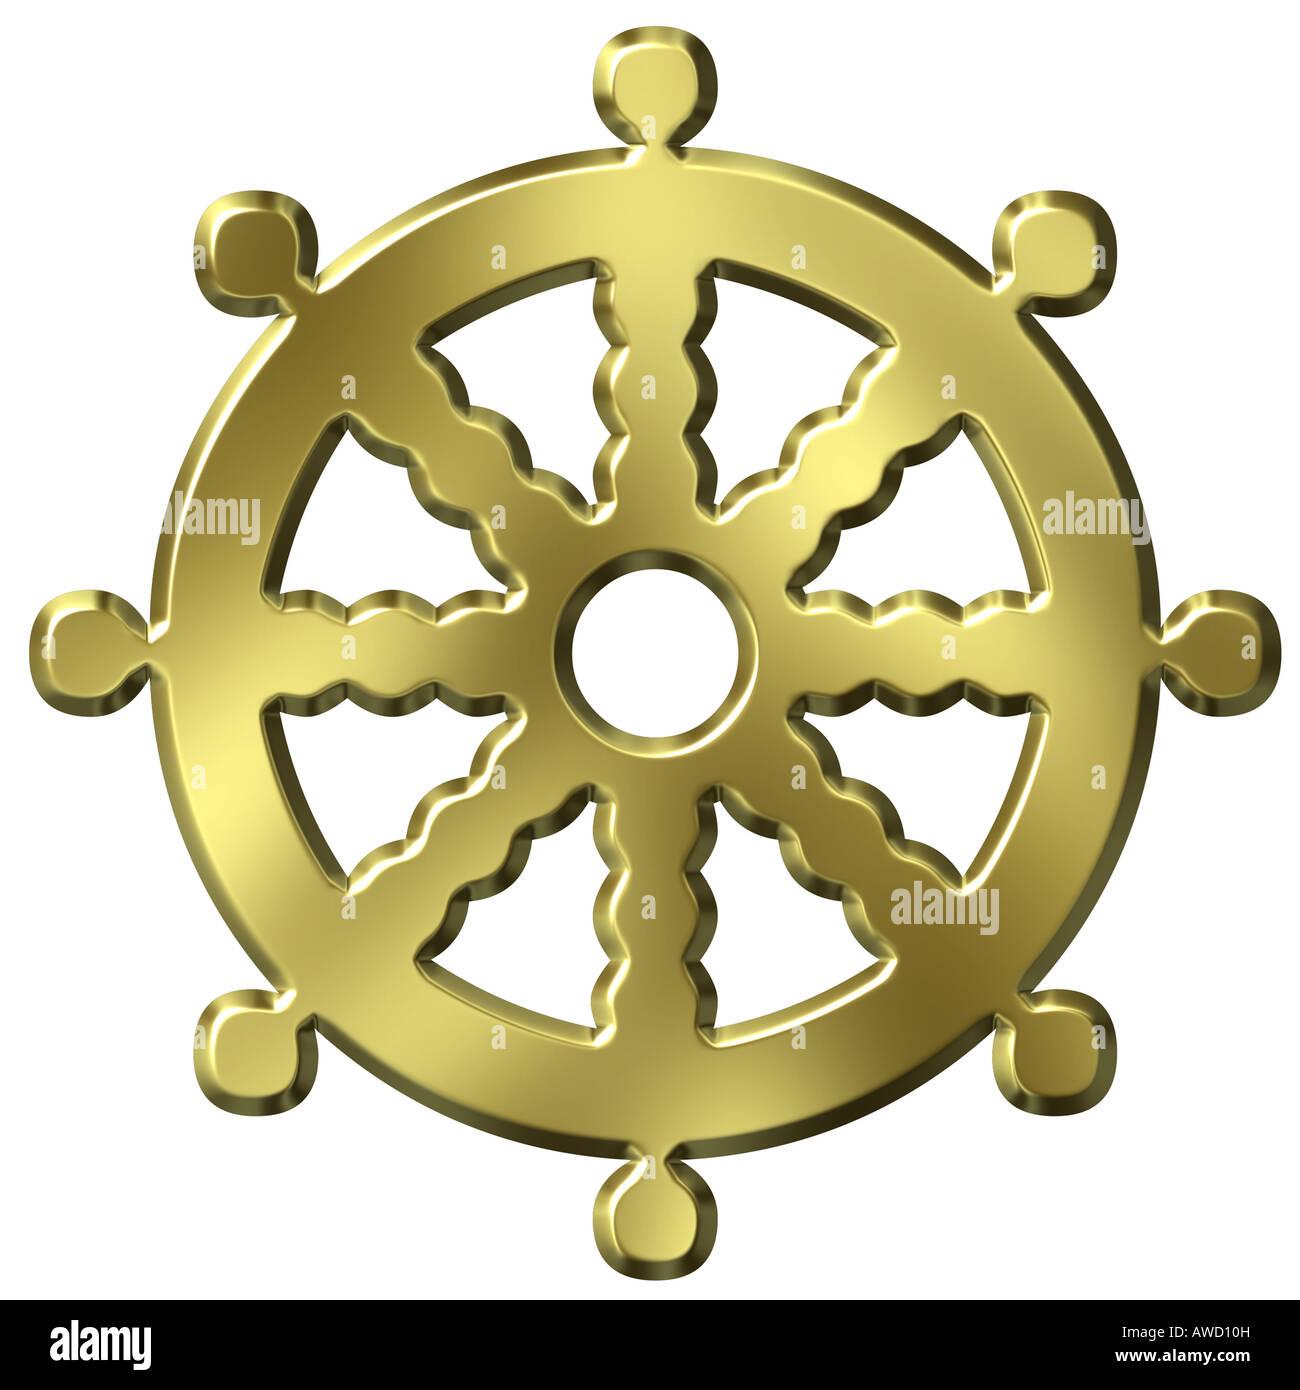 3d Golden Buddhismus Symbol Rad Des Lebens Stockfoto Bild 16542736